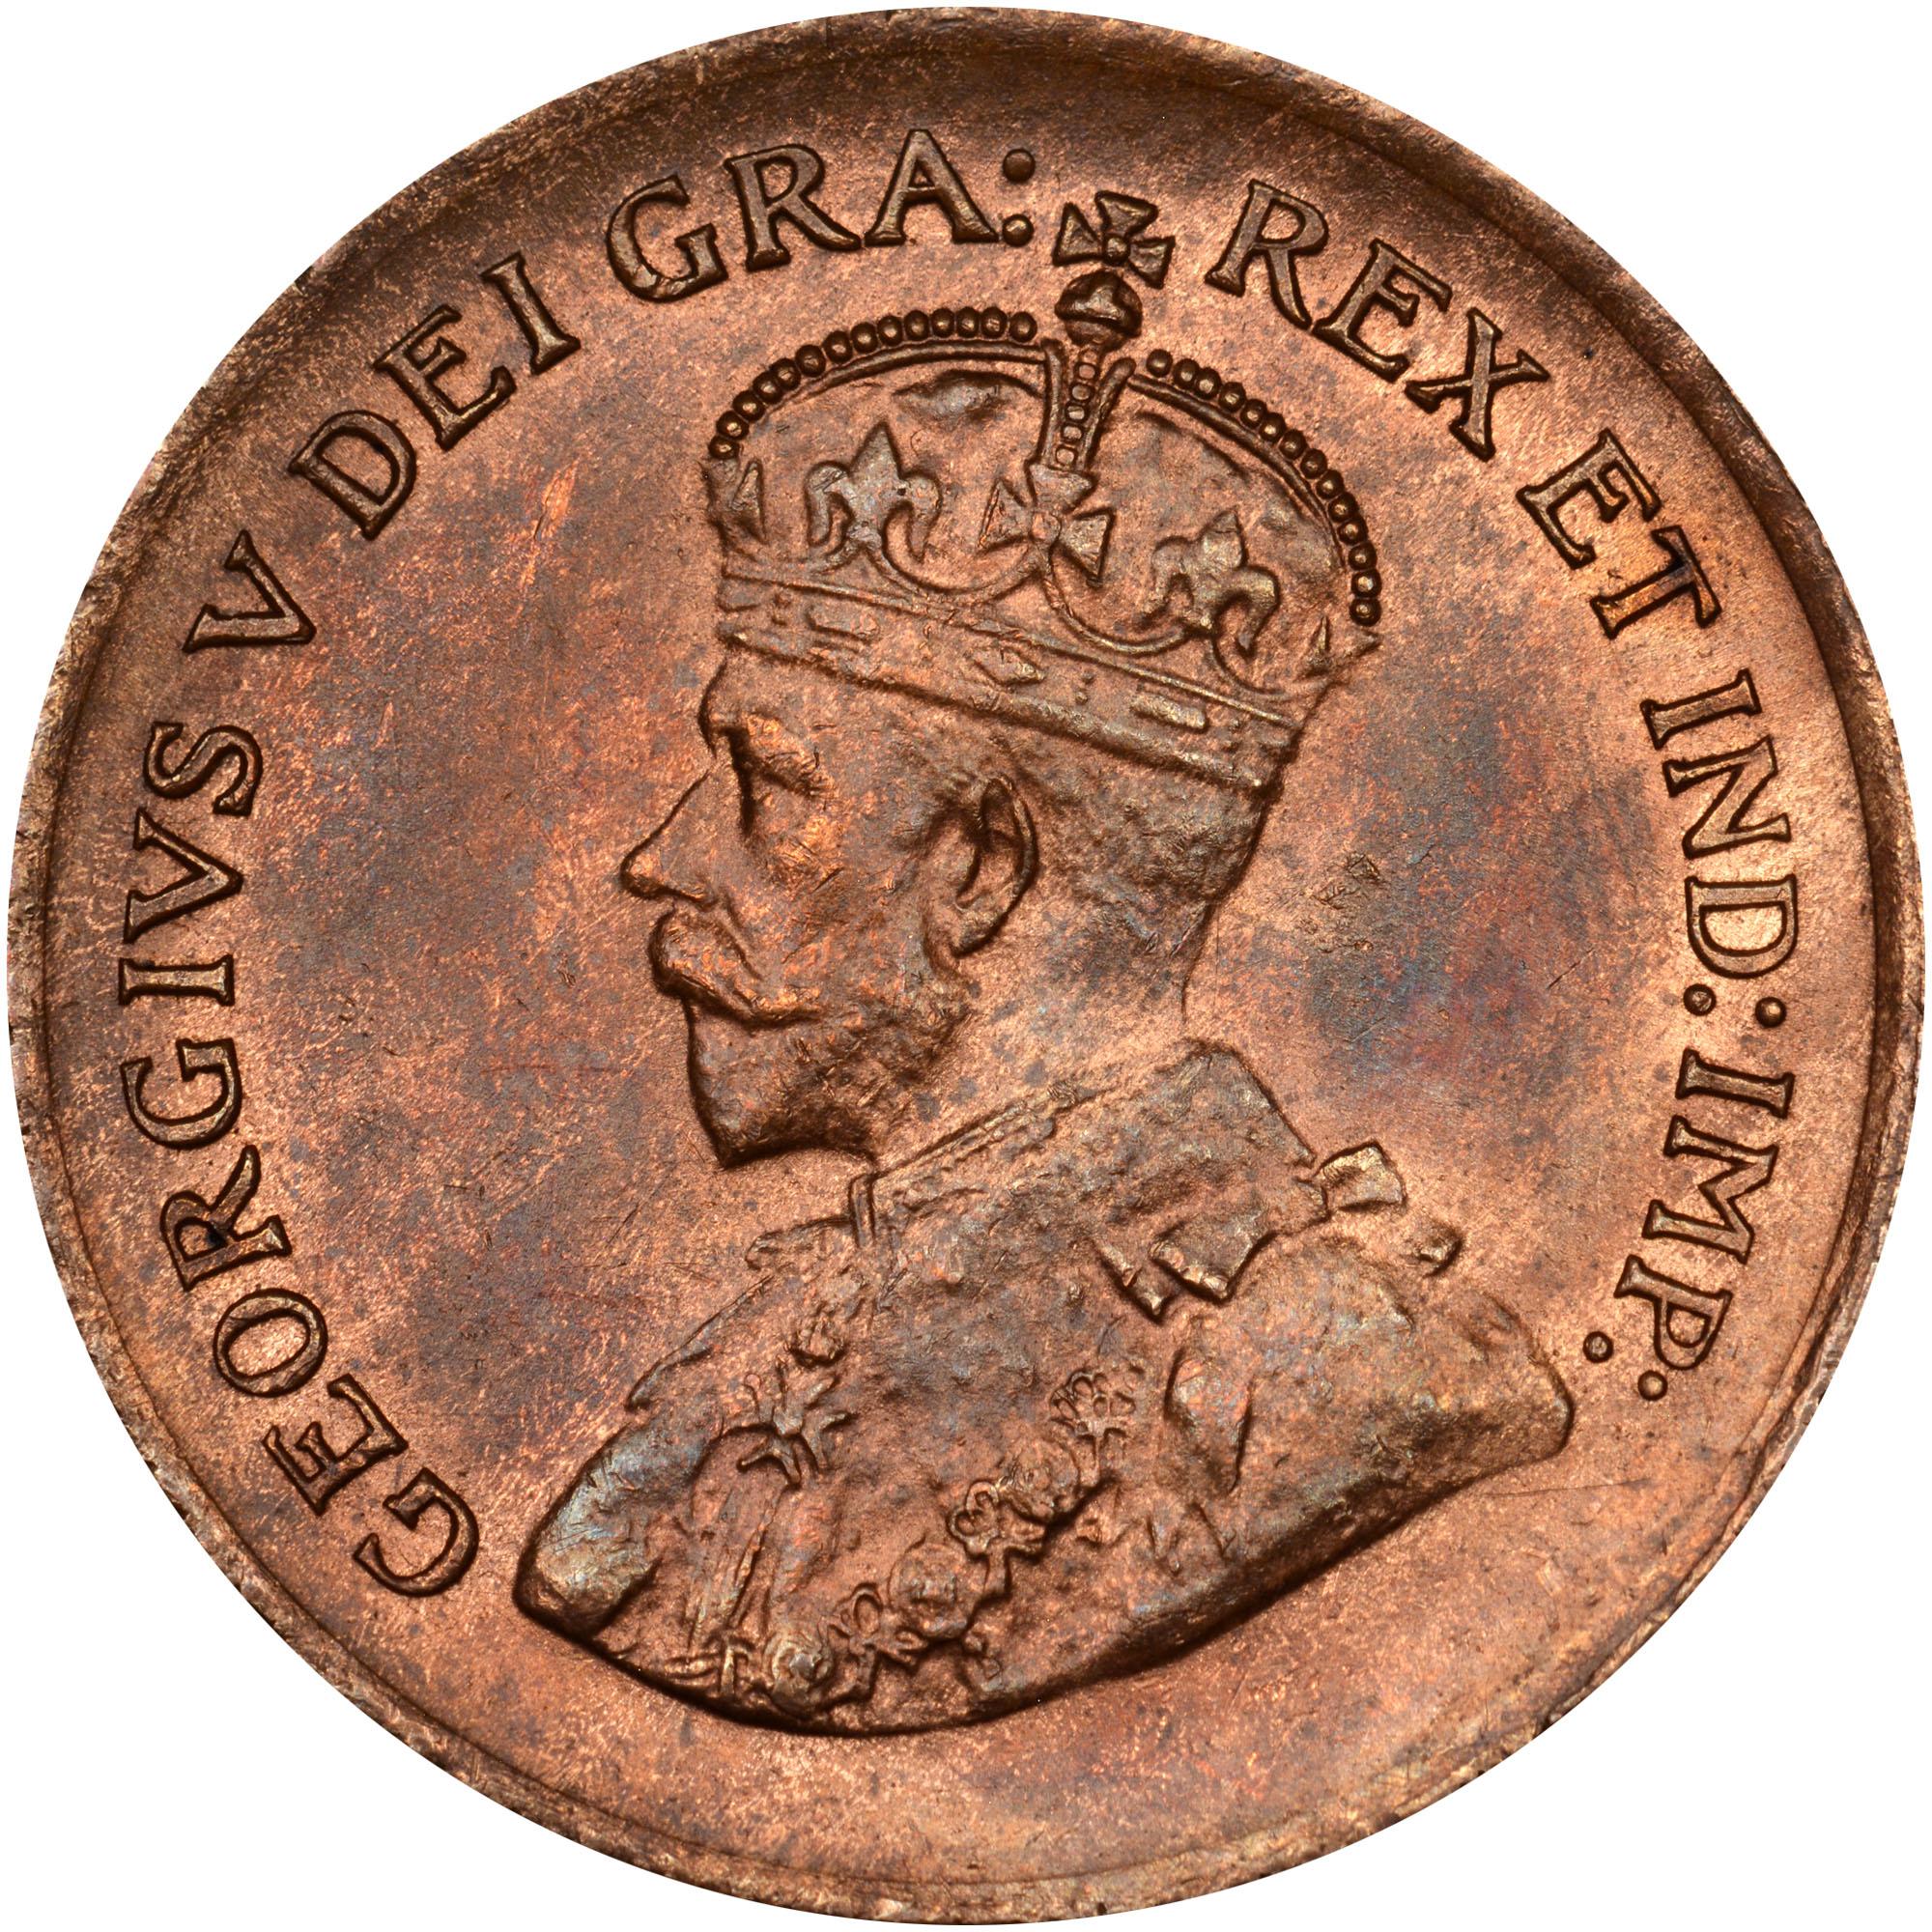 1920-1936 Canada Cent obverse